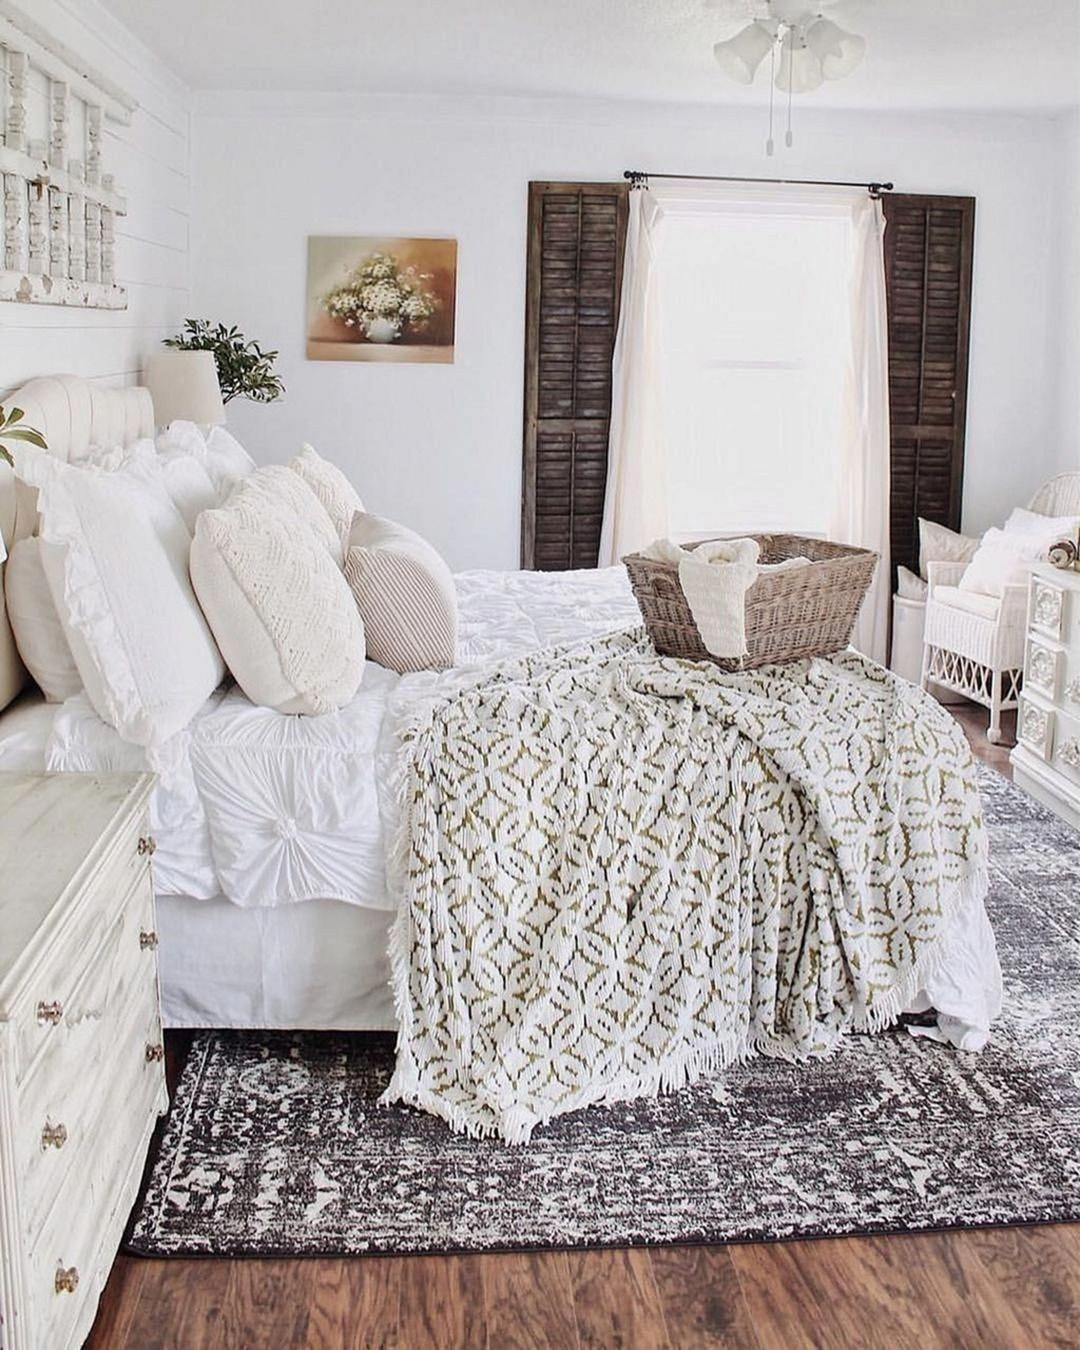 Kirklands Home Decor Outlet  Home decor bedroom, Farmhouse